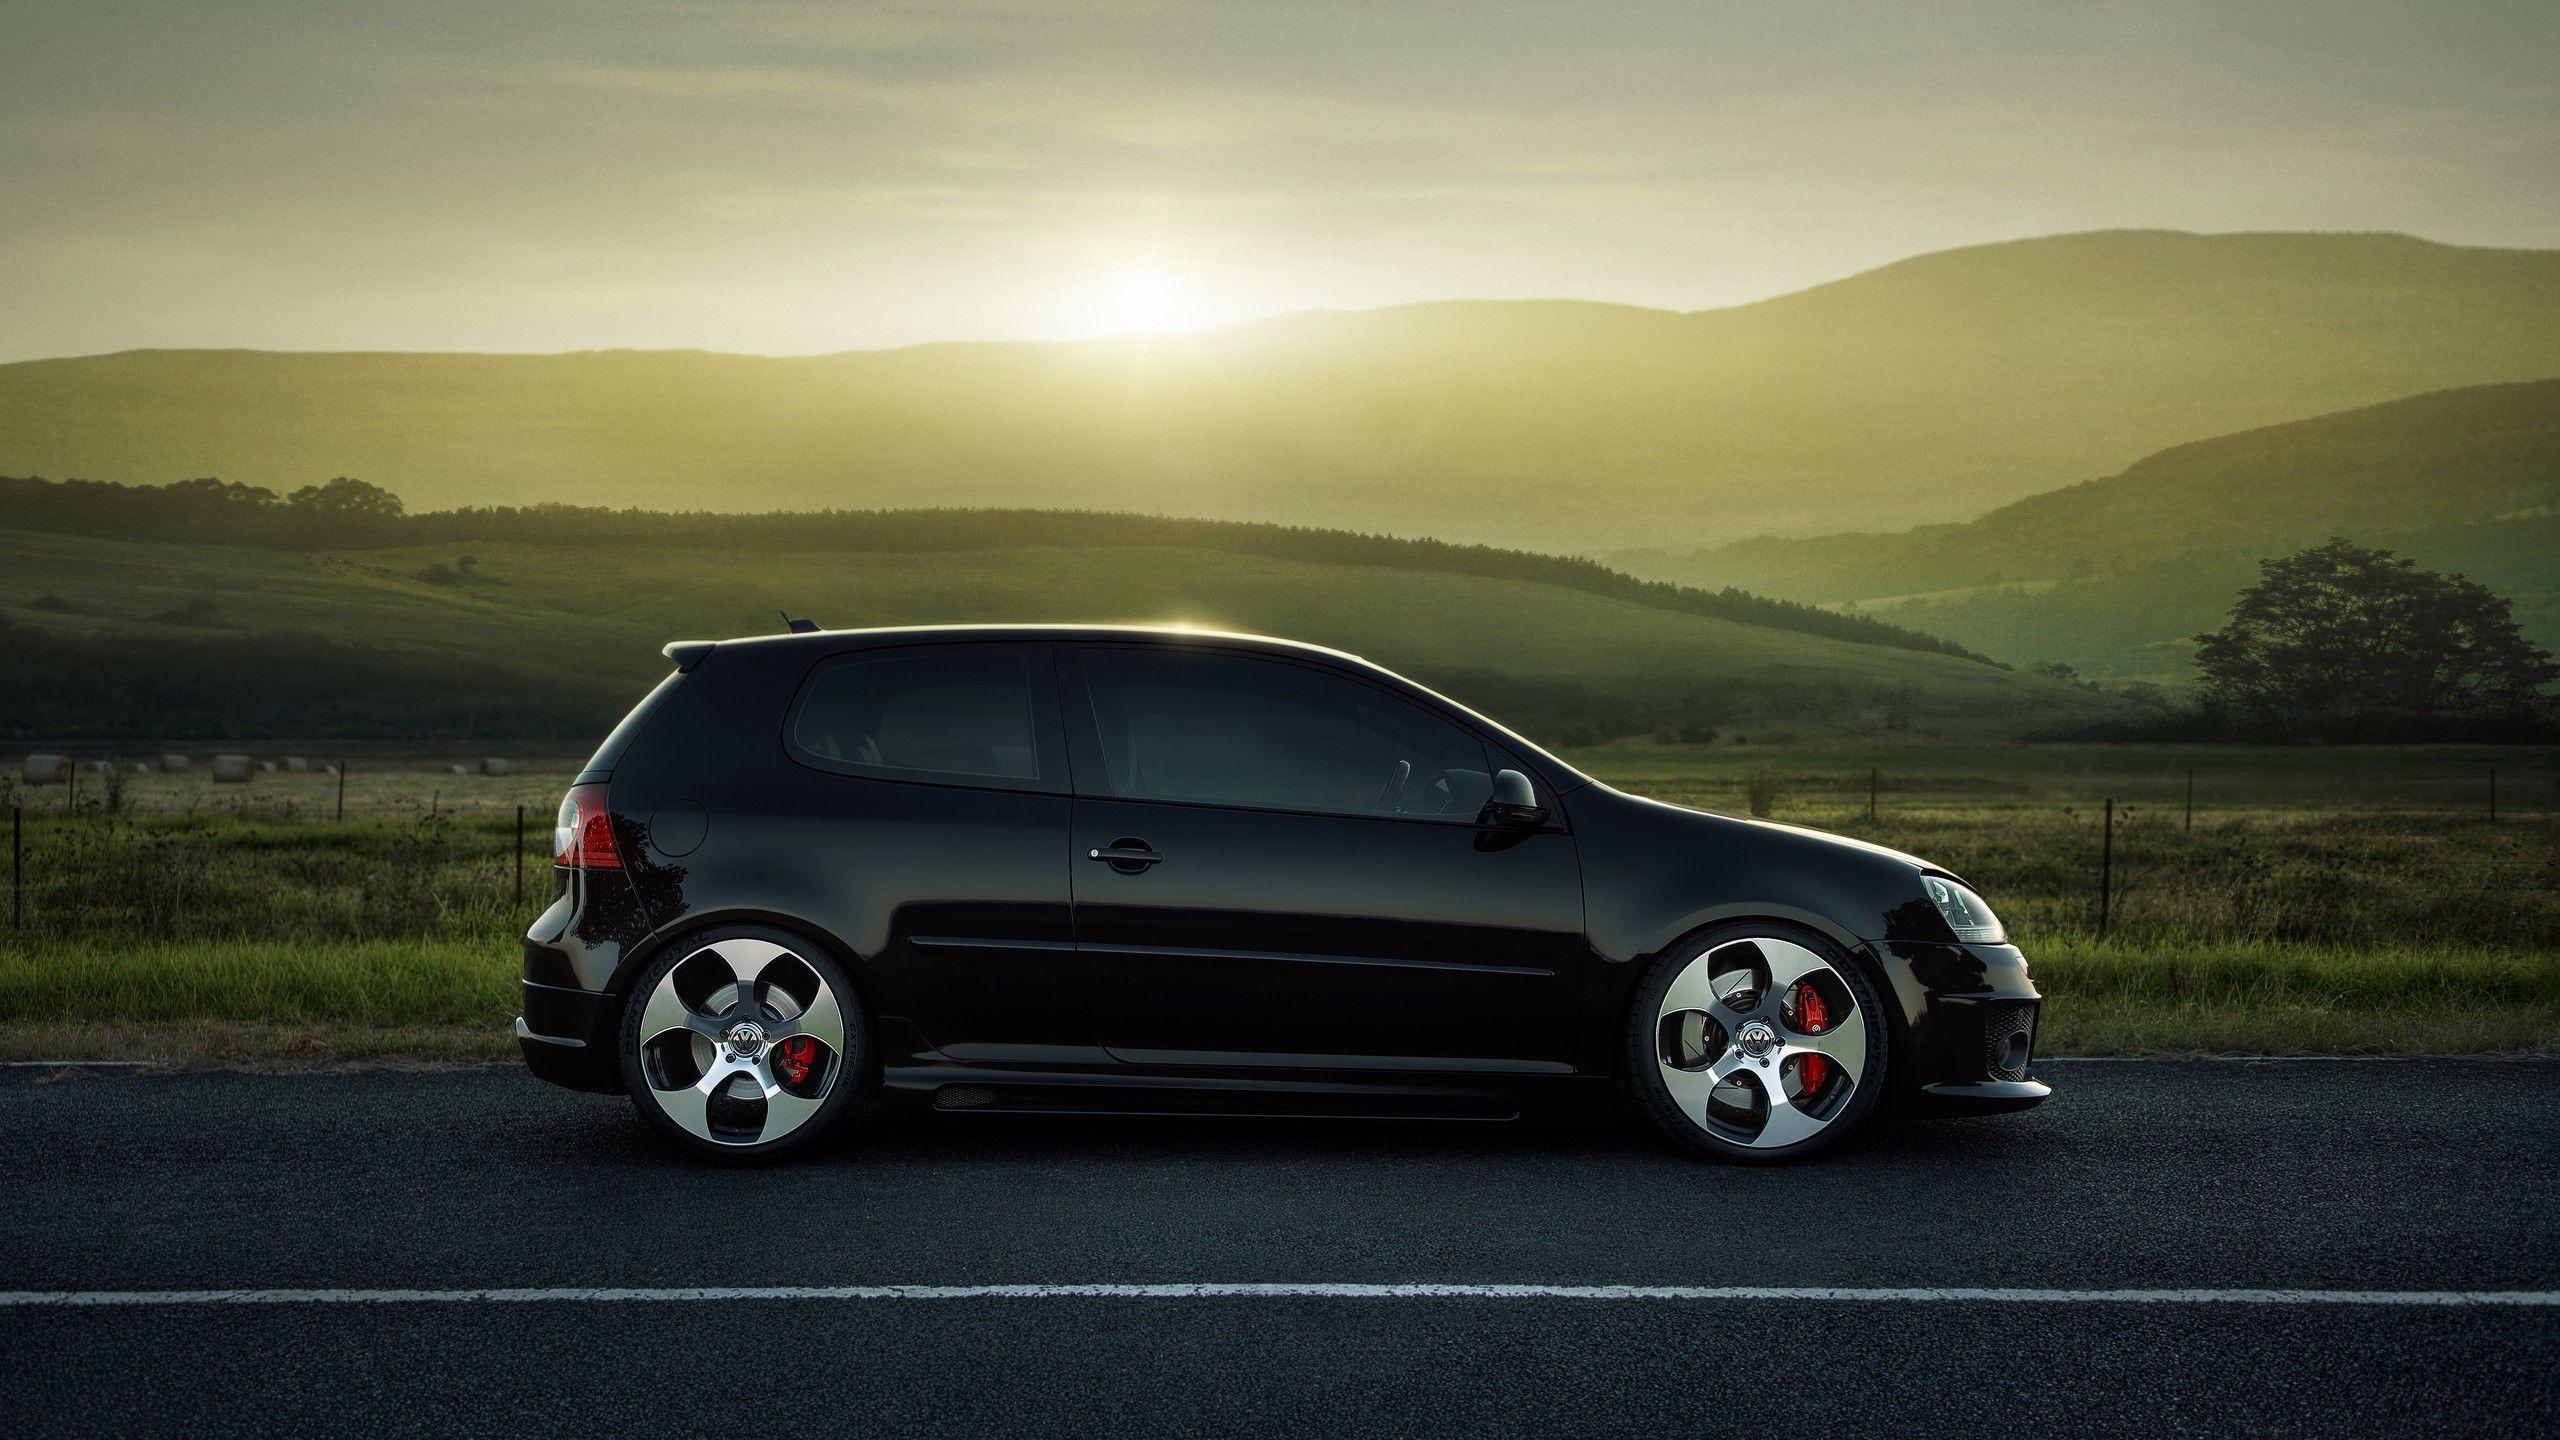 VW GTI Wallpapers Wallpaper Cave Фольксваген гольф